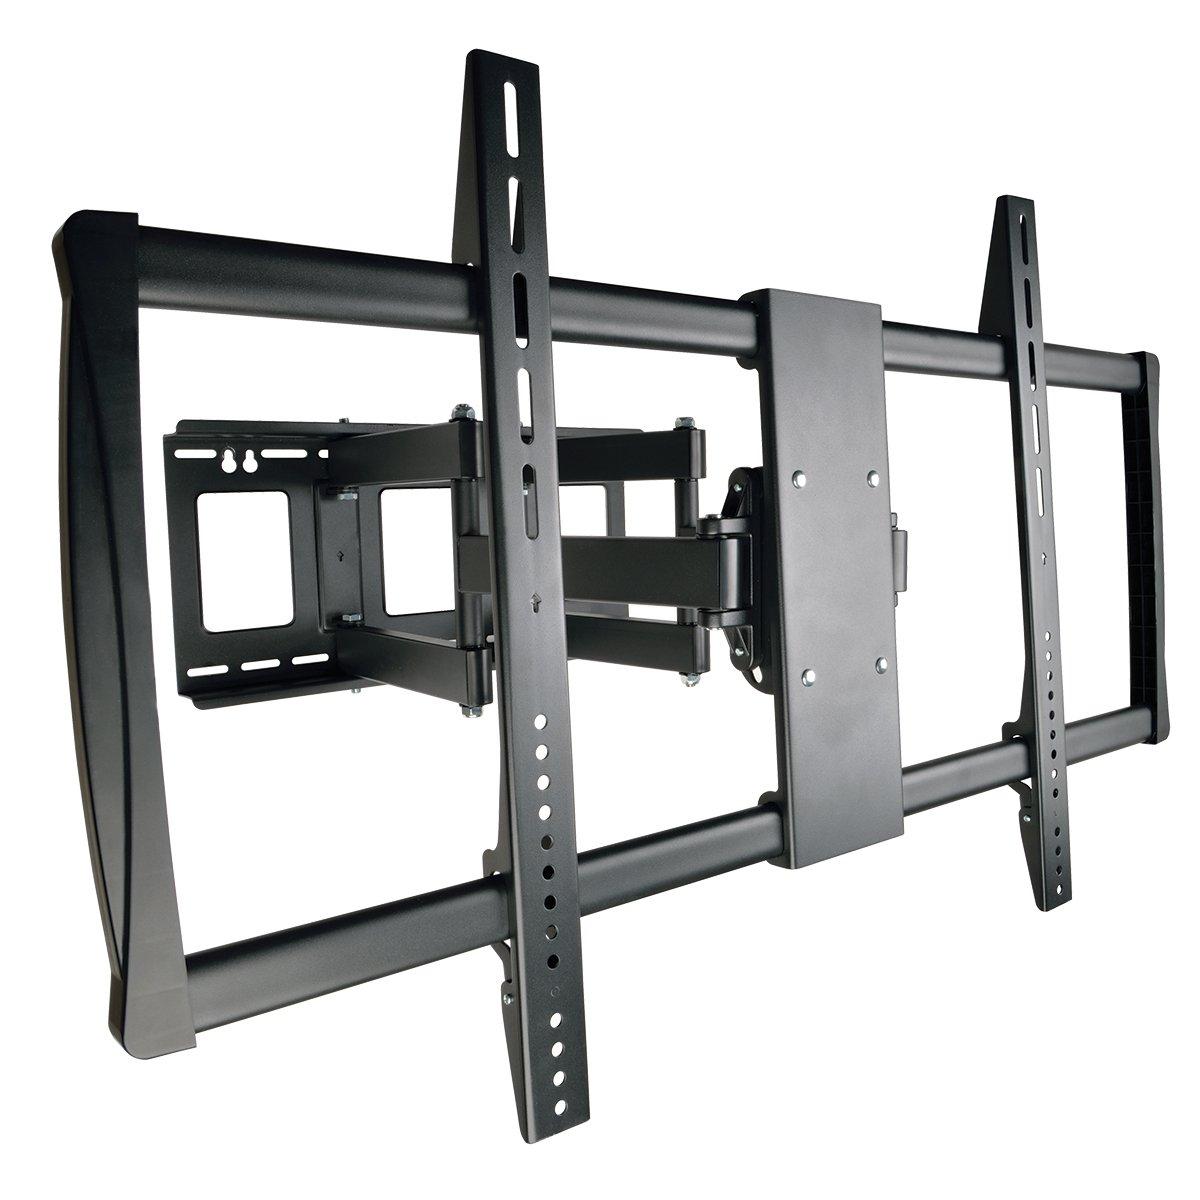 Tripp Lite Swivel/Tilt Wall Mount with Arm for 60'' to 100'' TVs, Monitors, Flat Screens, LED, Plasma or LCD Displays (DWM60100XX)